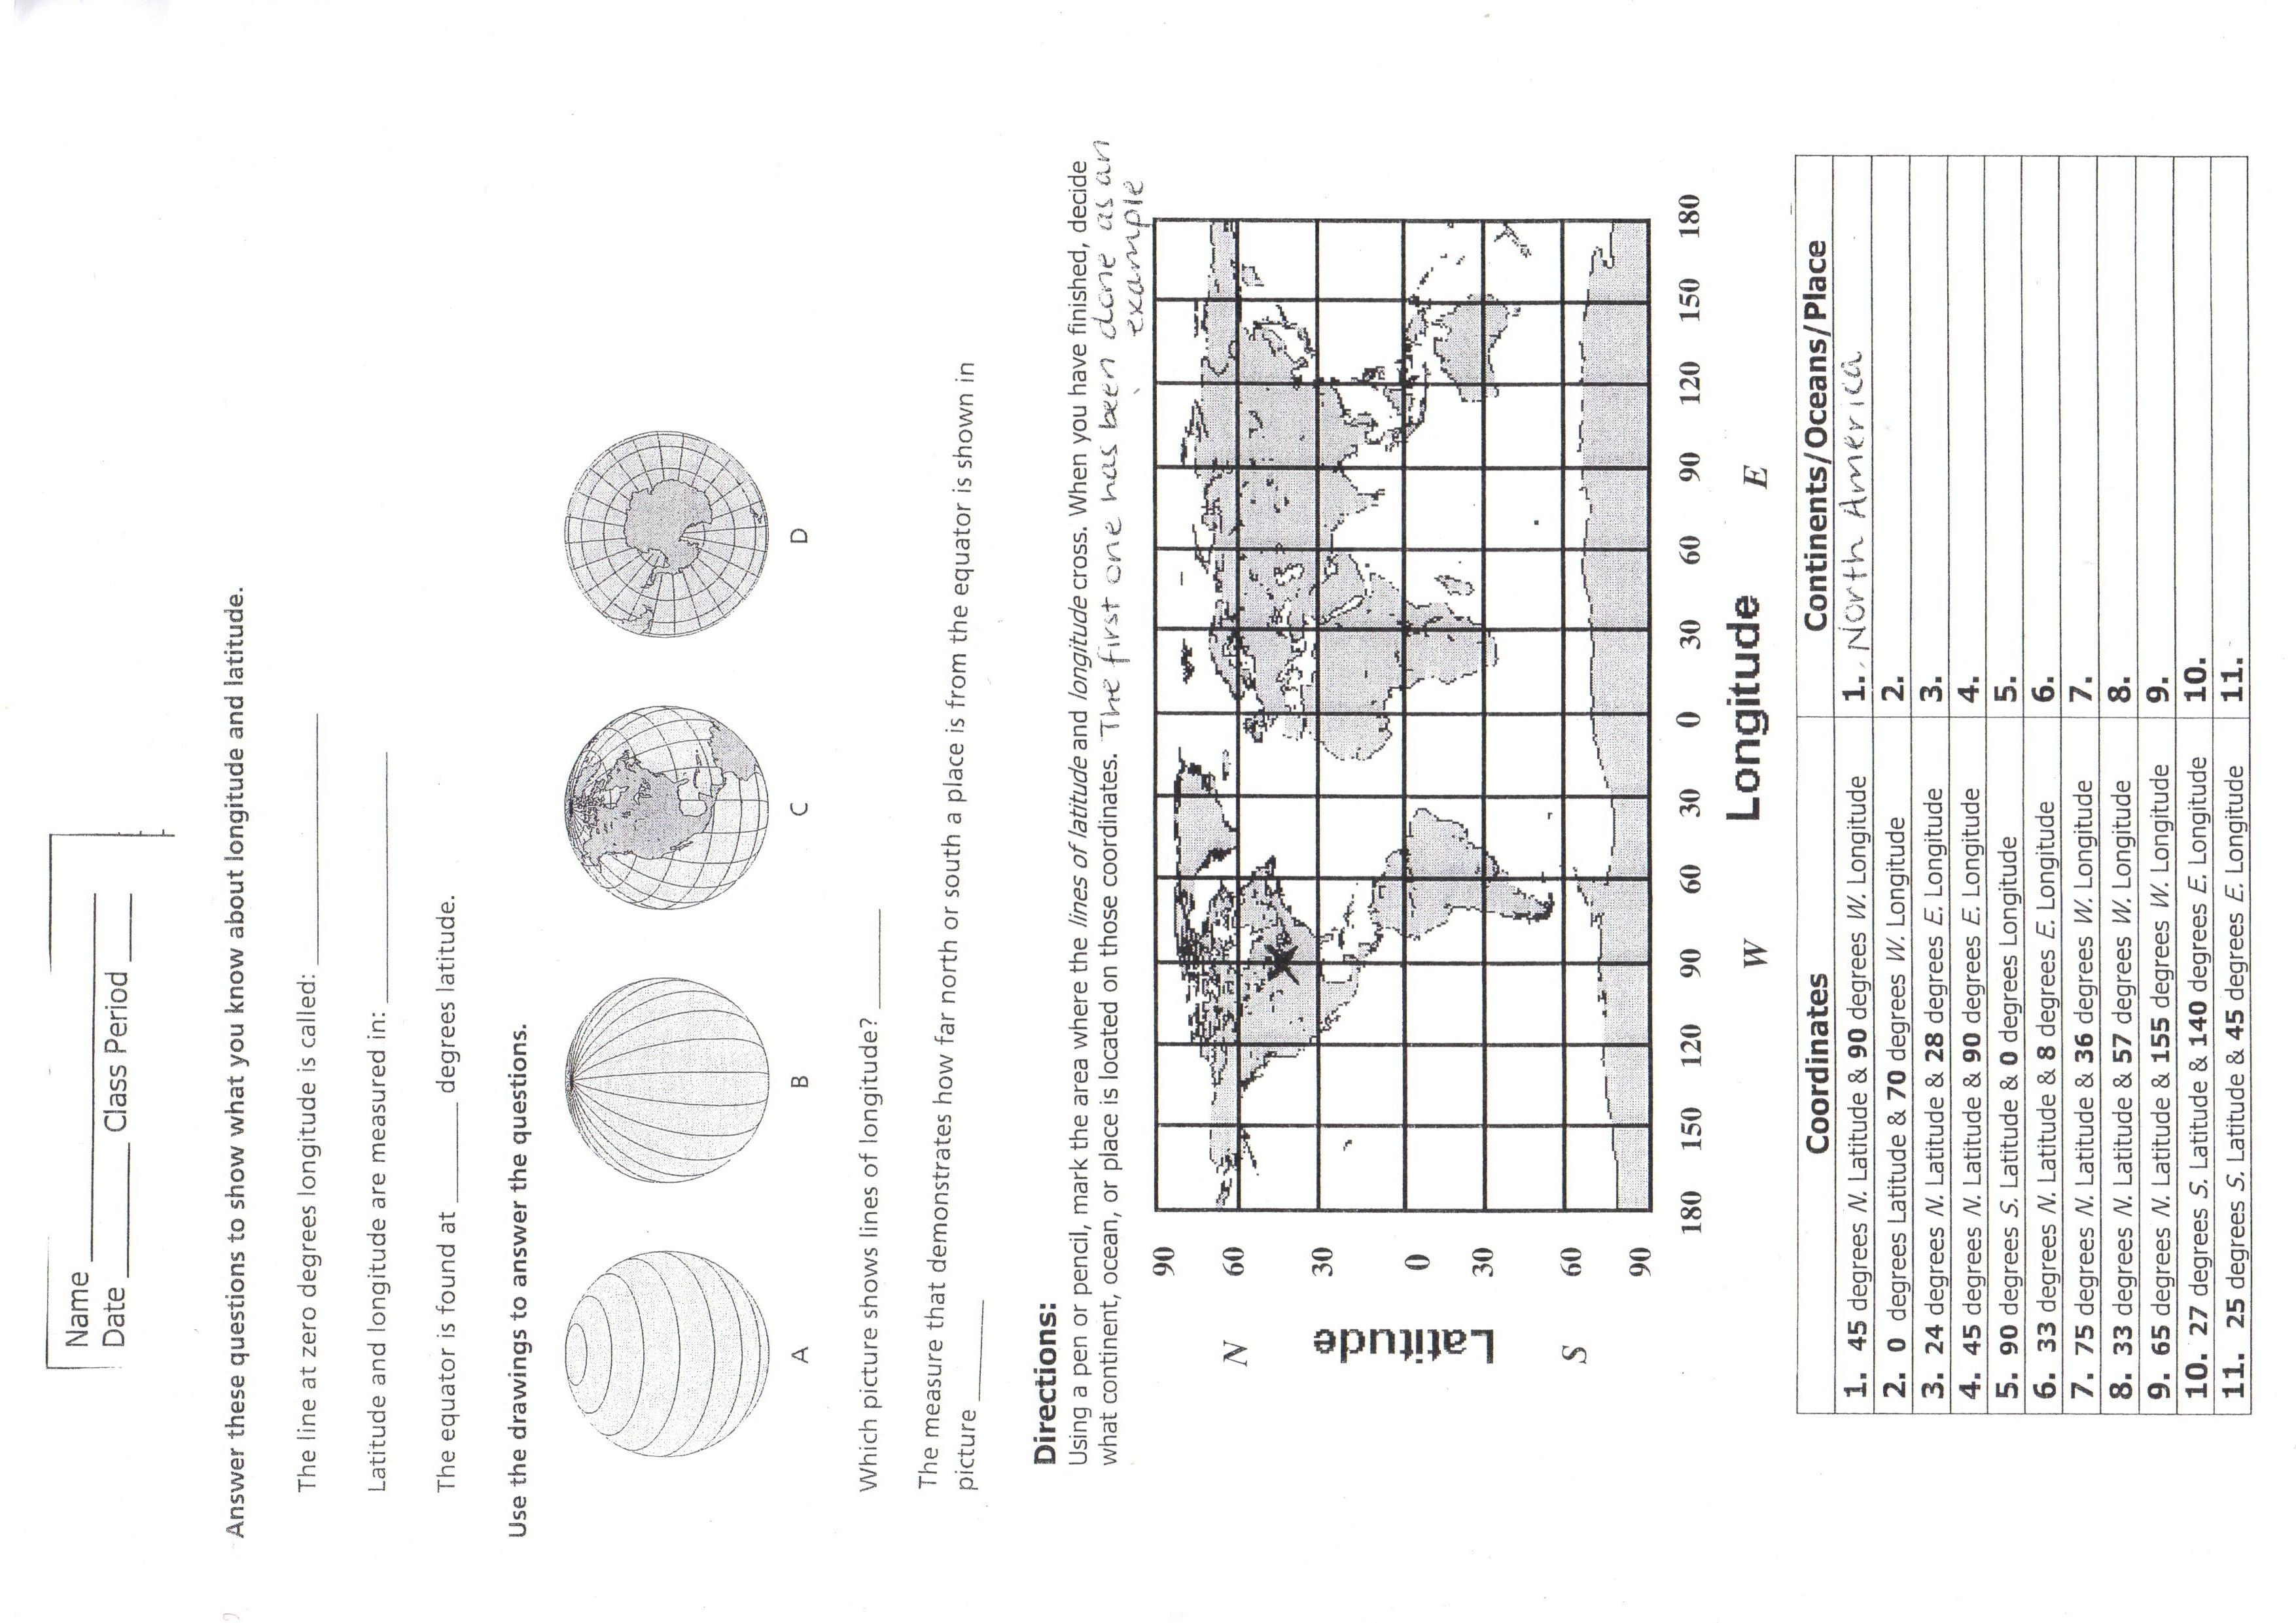 Latitude Longitude And Time Zones Worksheets